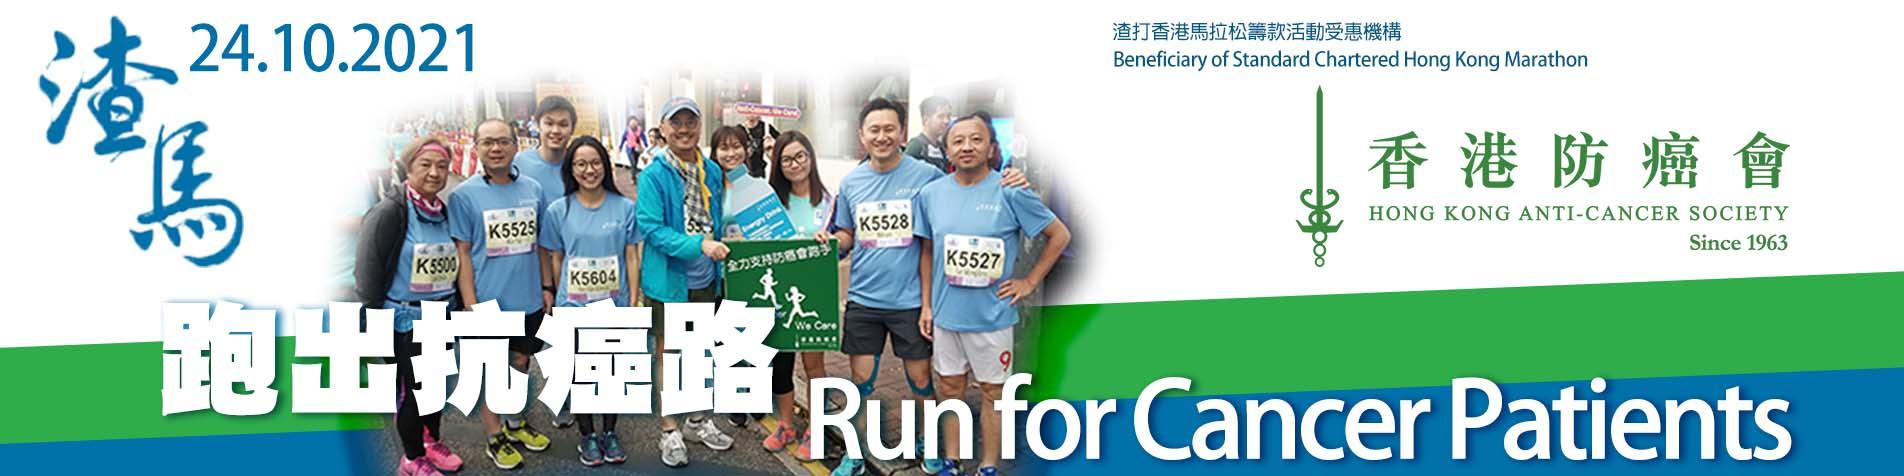 FringeBacker Fundraiser THE STANDARD CHARTERED HONG KONG MARATHON 2021